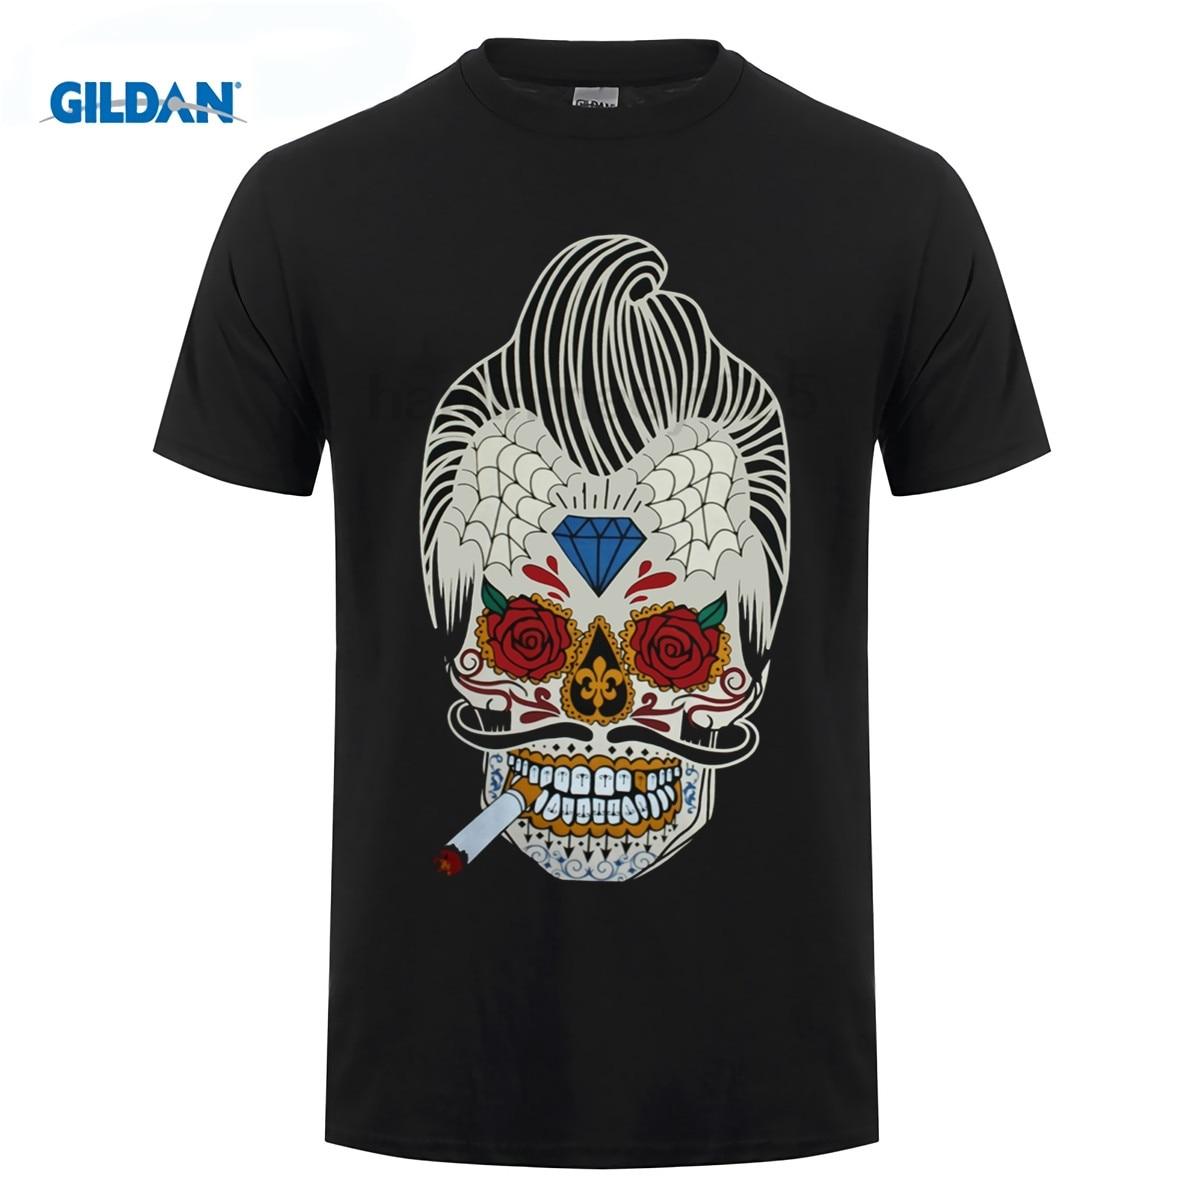 GILDAN sling shot graphic t-shirt Mens new cool 2018 latest fashion New Fashion autumn Best T Shirts Online